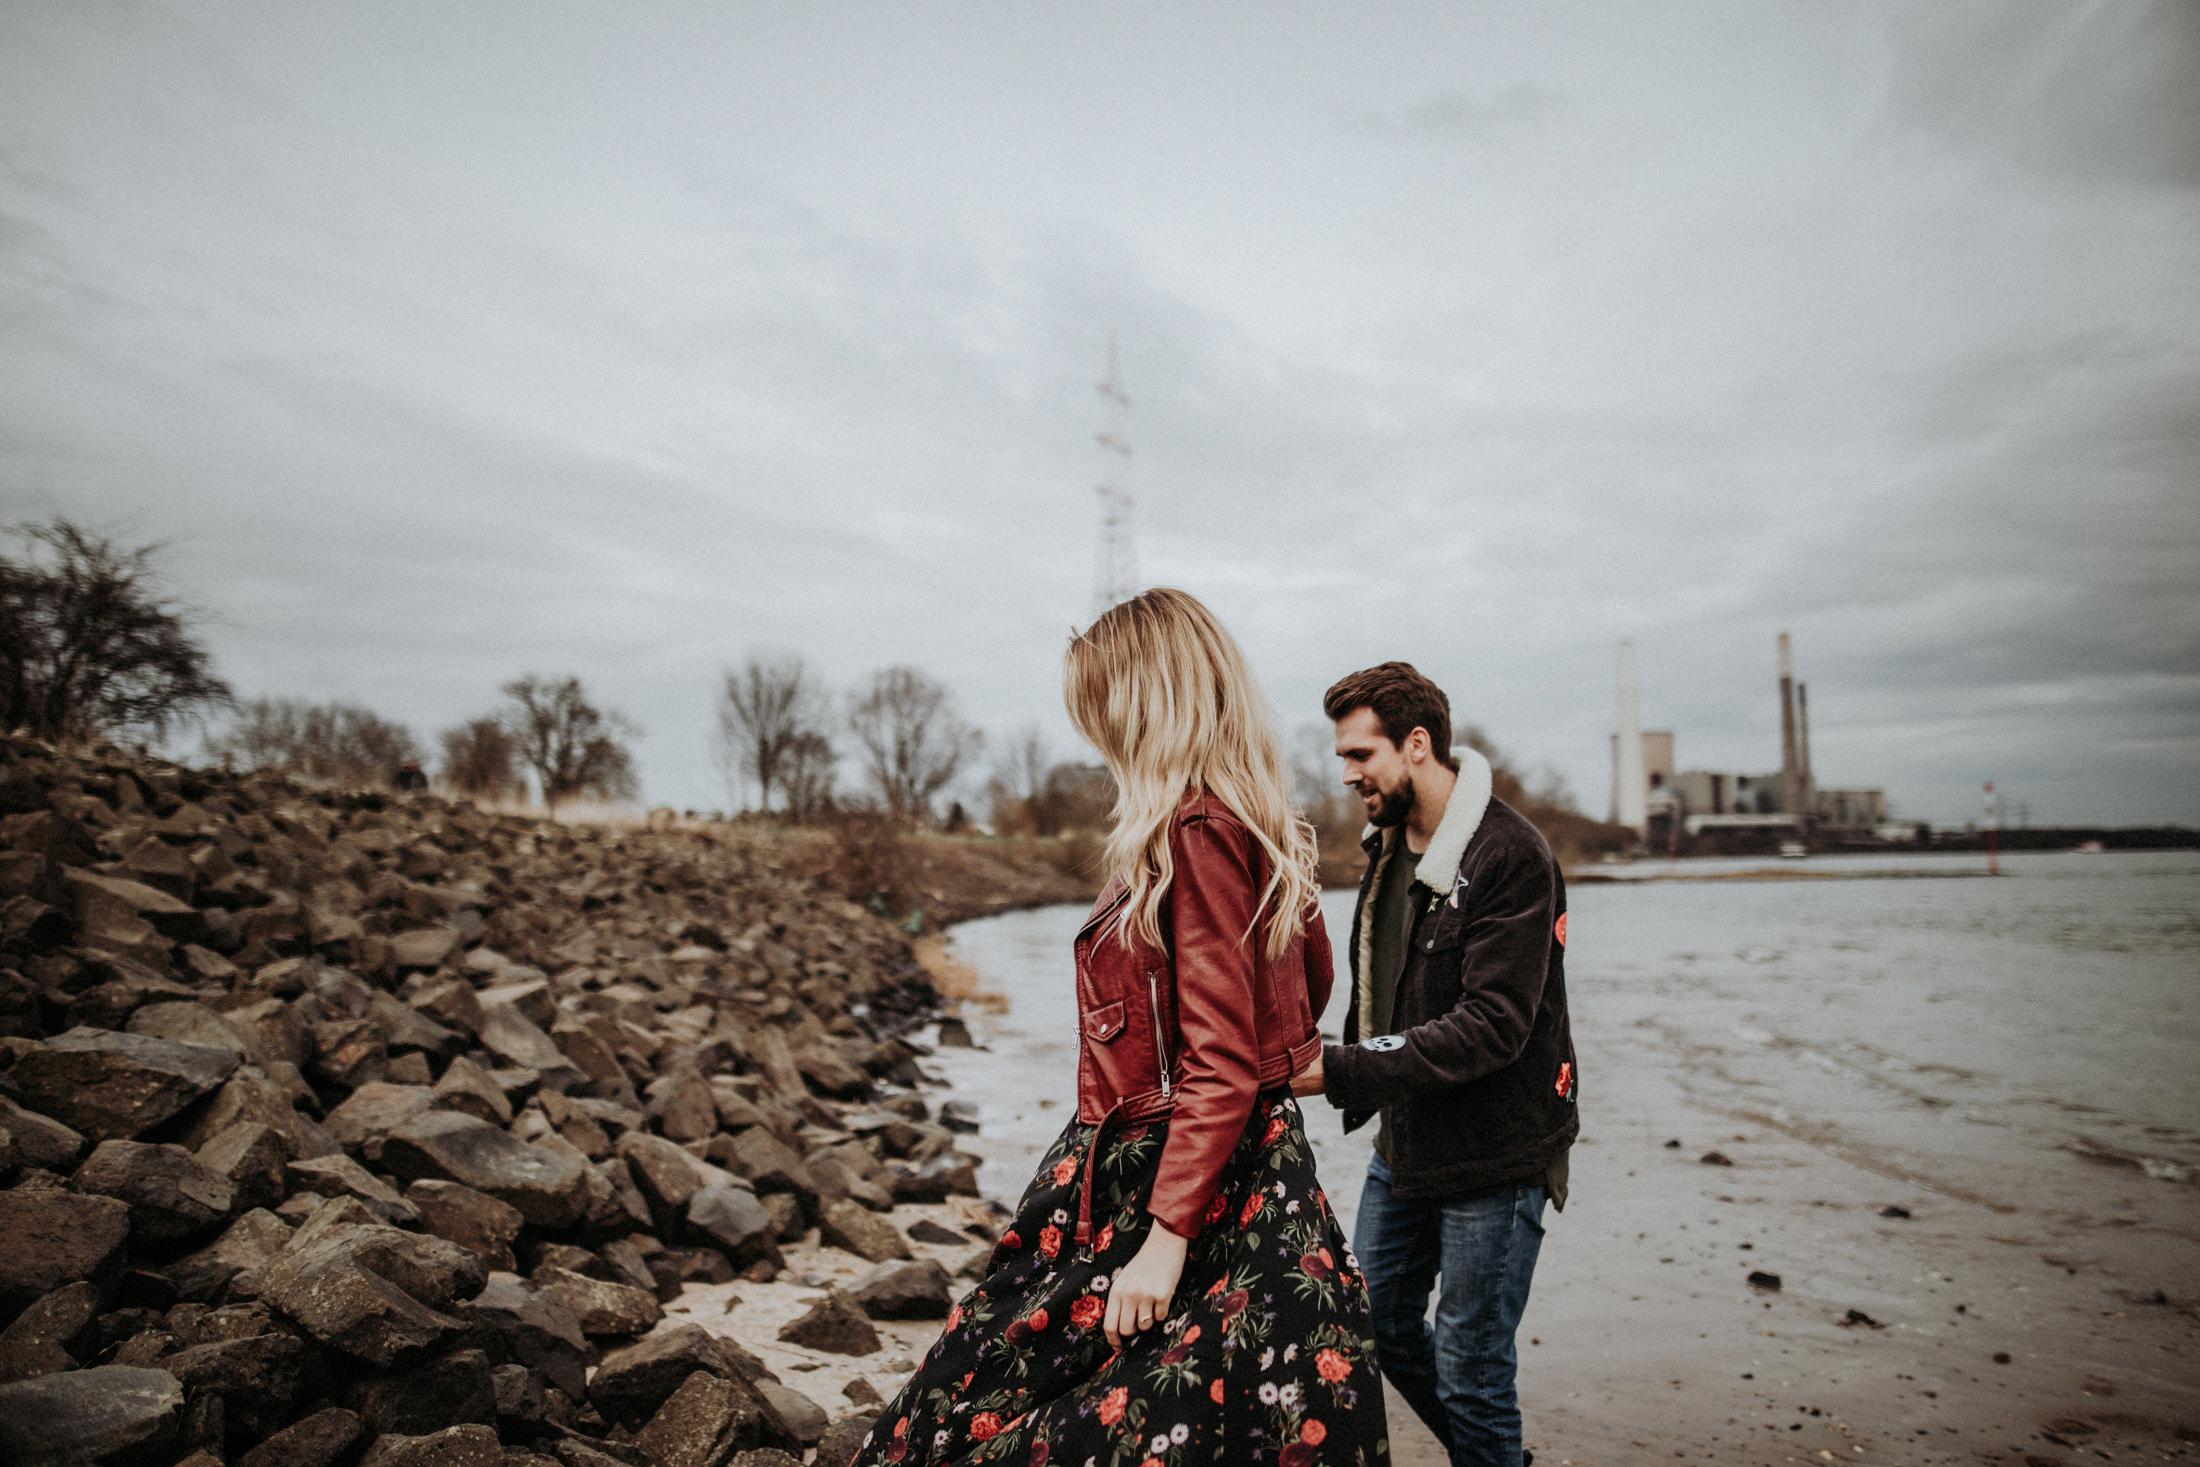 Wedding_Photographer_Mallorca_DanielaMarquardt_Photography_CanaryIslands_Lanzarote_Iceland_Tuscany_Santorini_Portugal_NewYork_Spain_Elopement_Hochzeitsfotograf_CK31